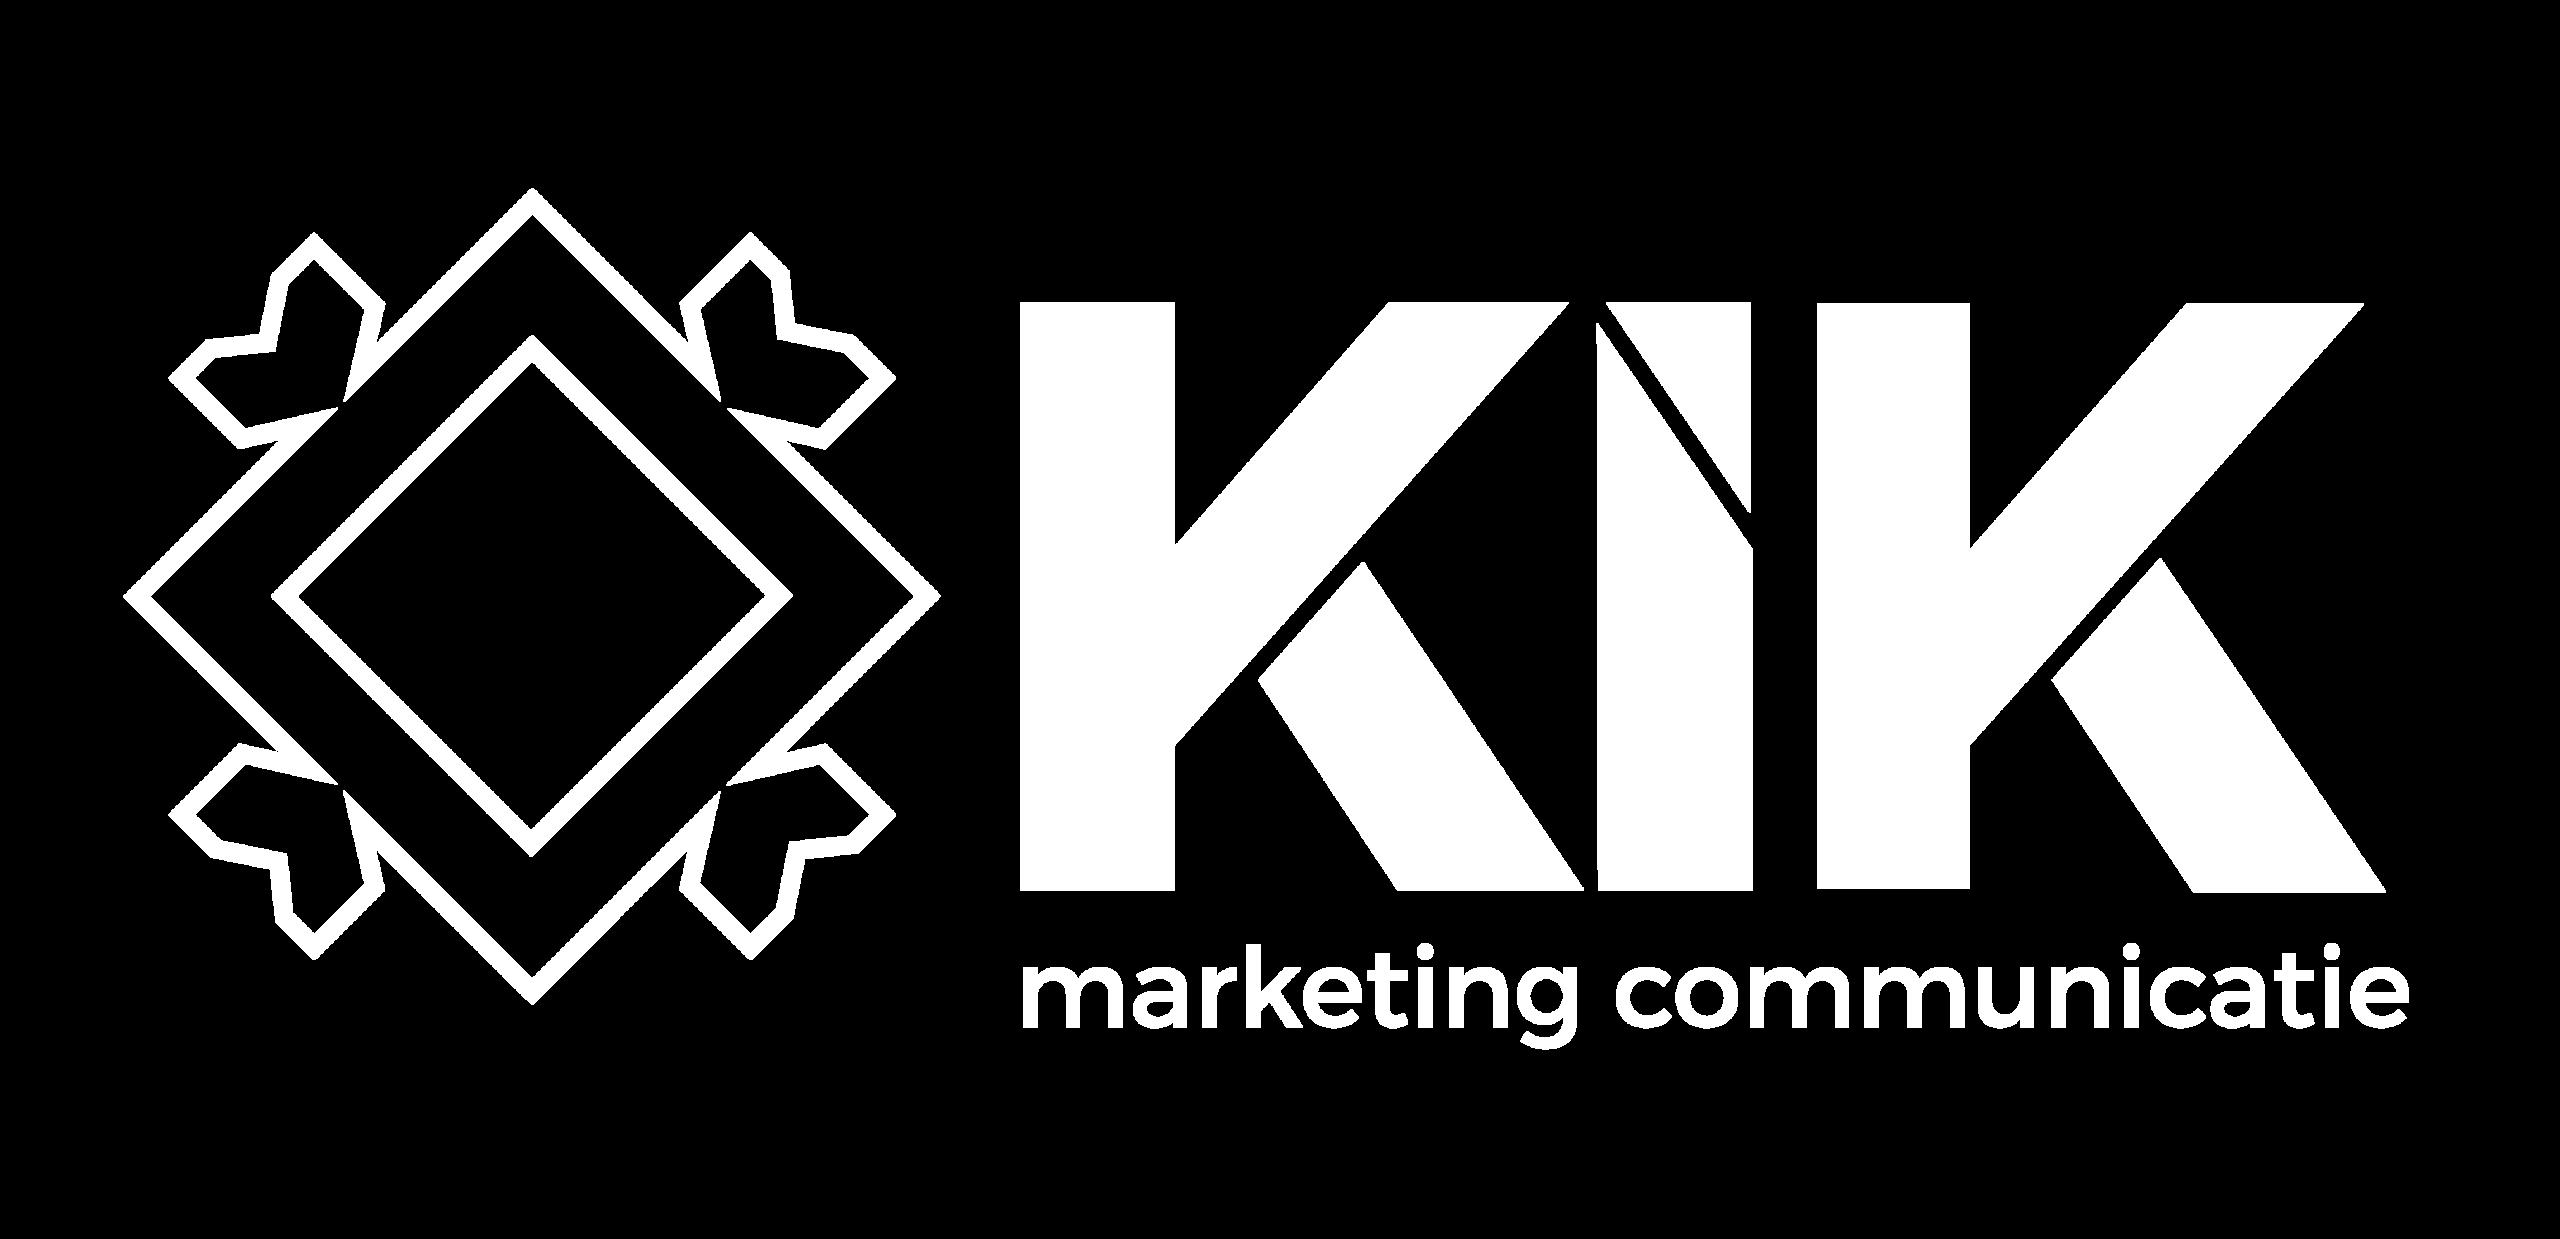 KIK marketing communicatie